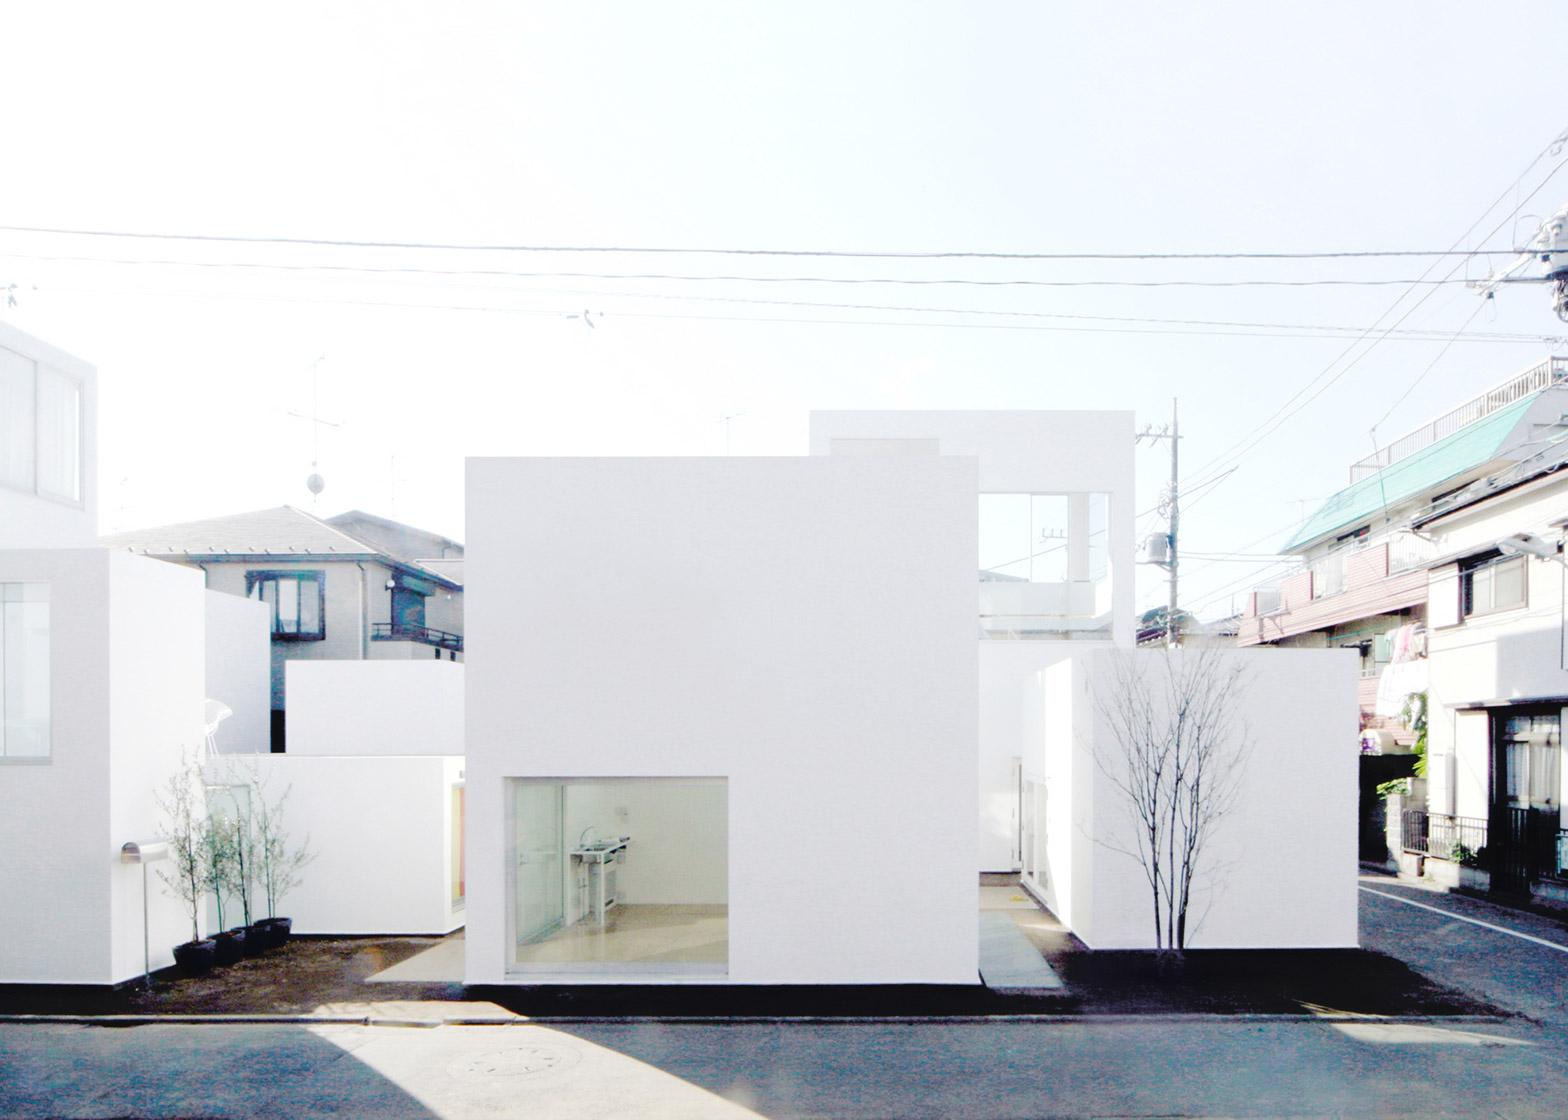 Moriyama House, Tokyo, Japan by Ryue Nishizawa, 2002-2005